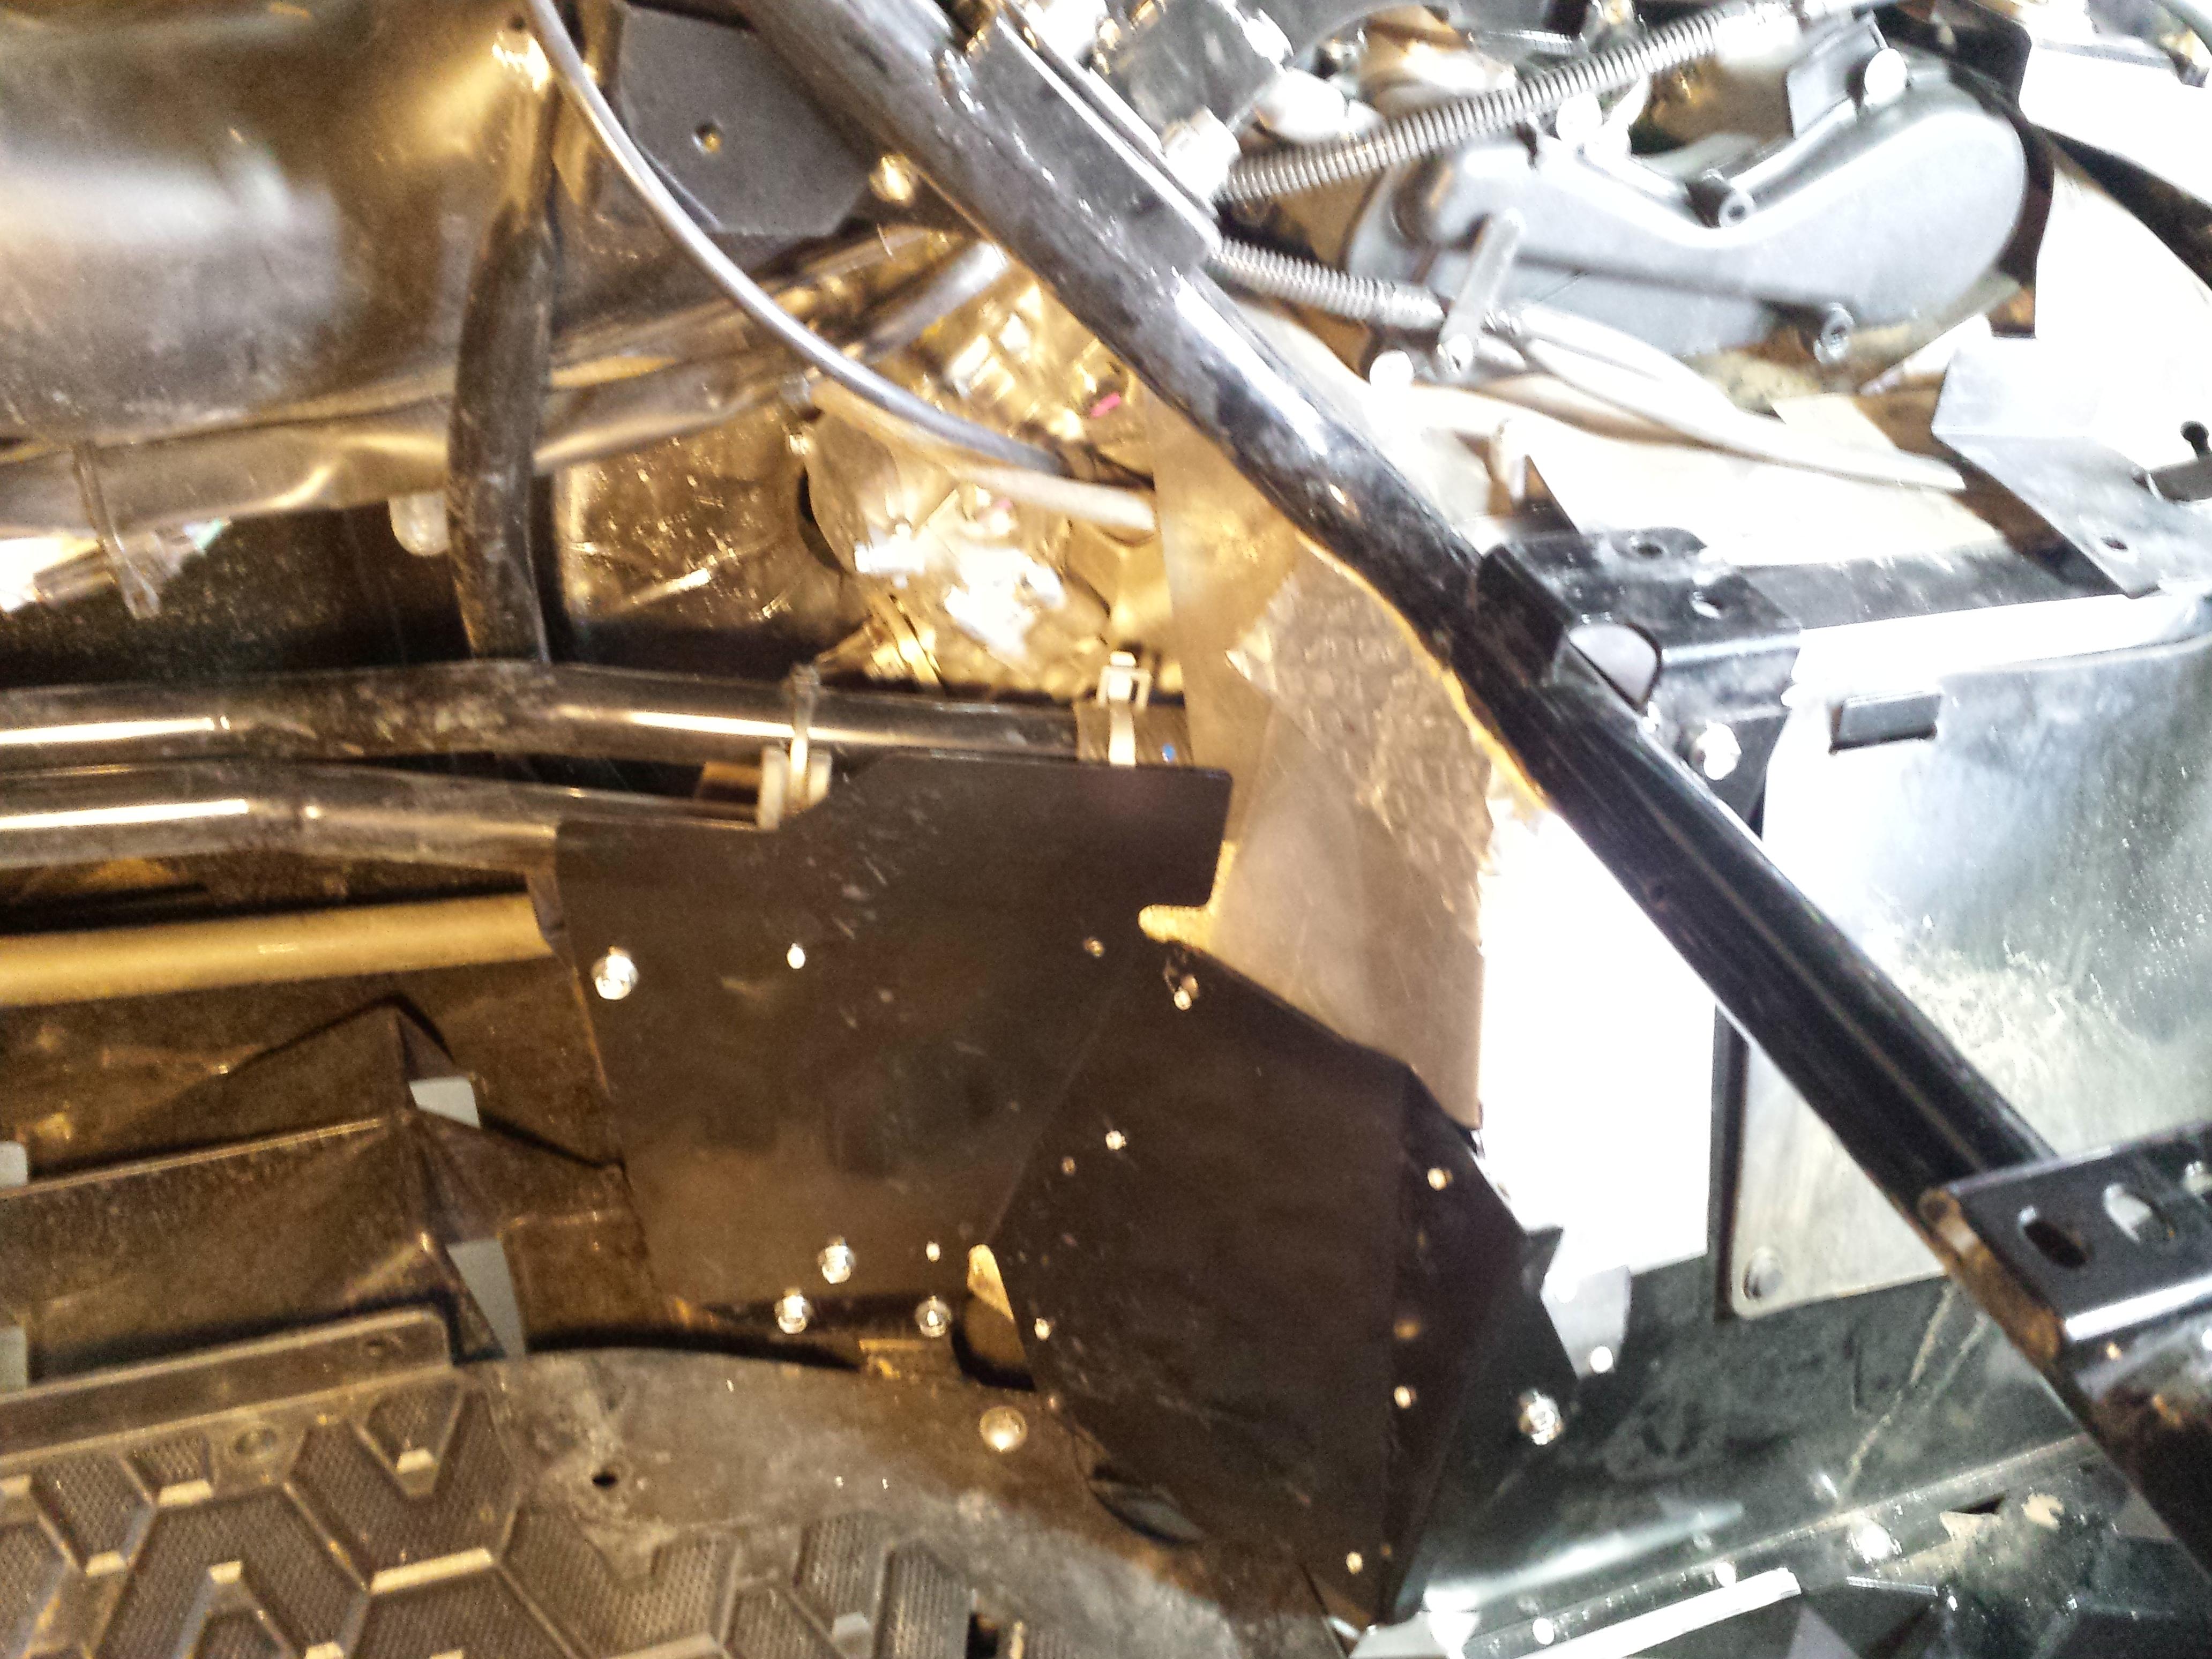 Is the extreme cabin heat problem fixed? - Kawasaki Teryx Forum